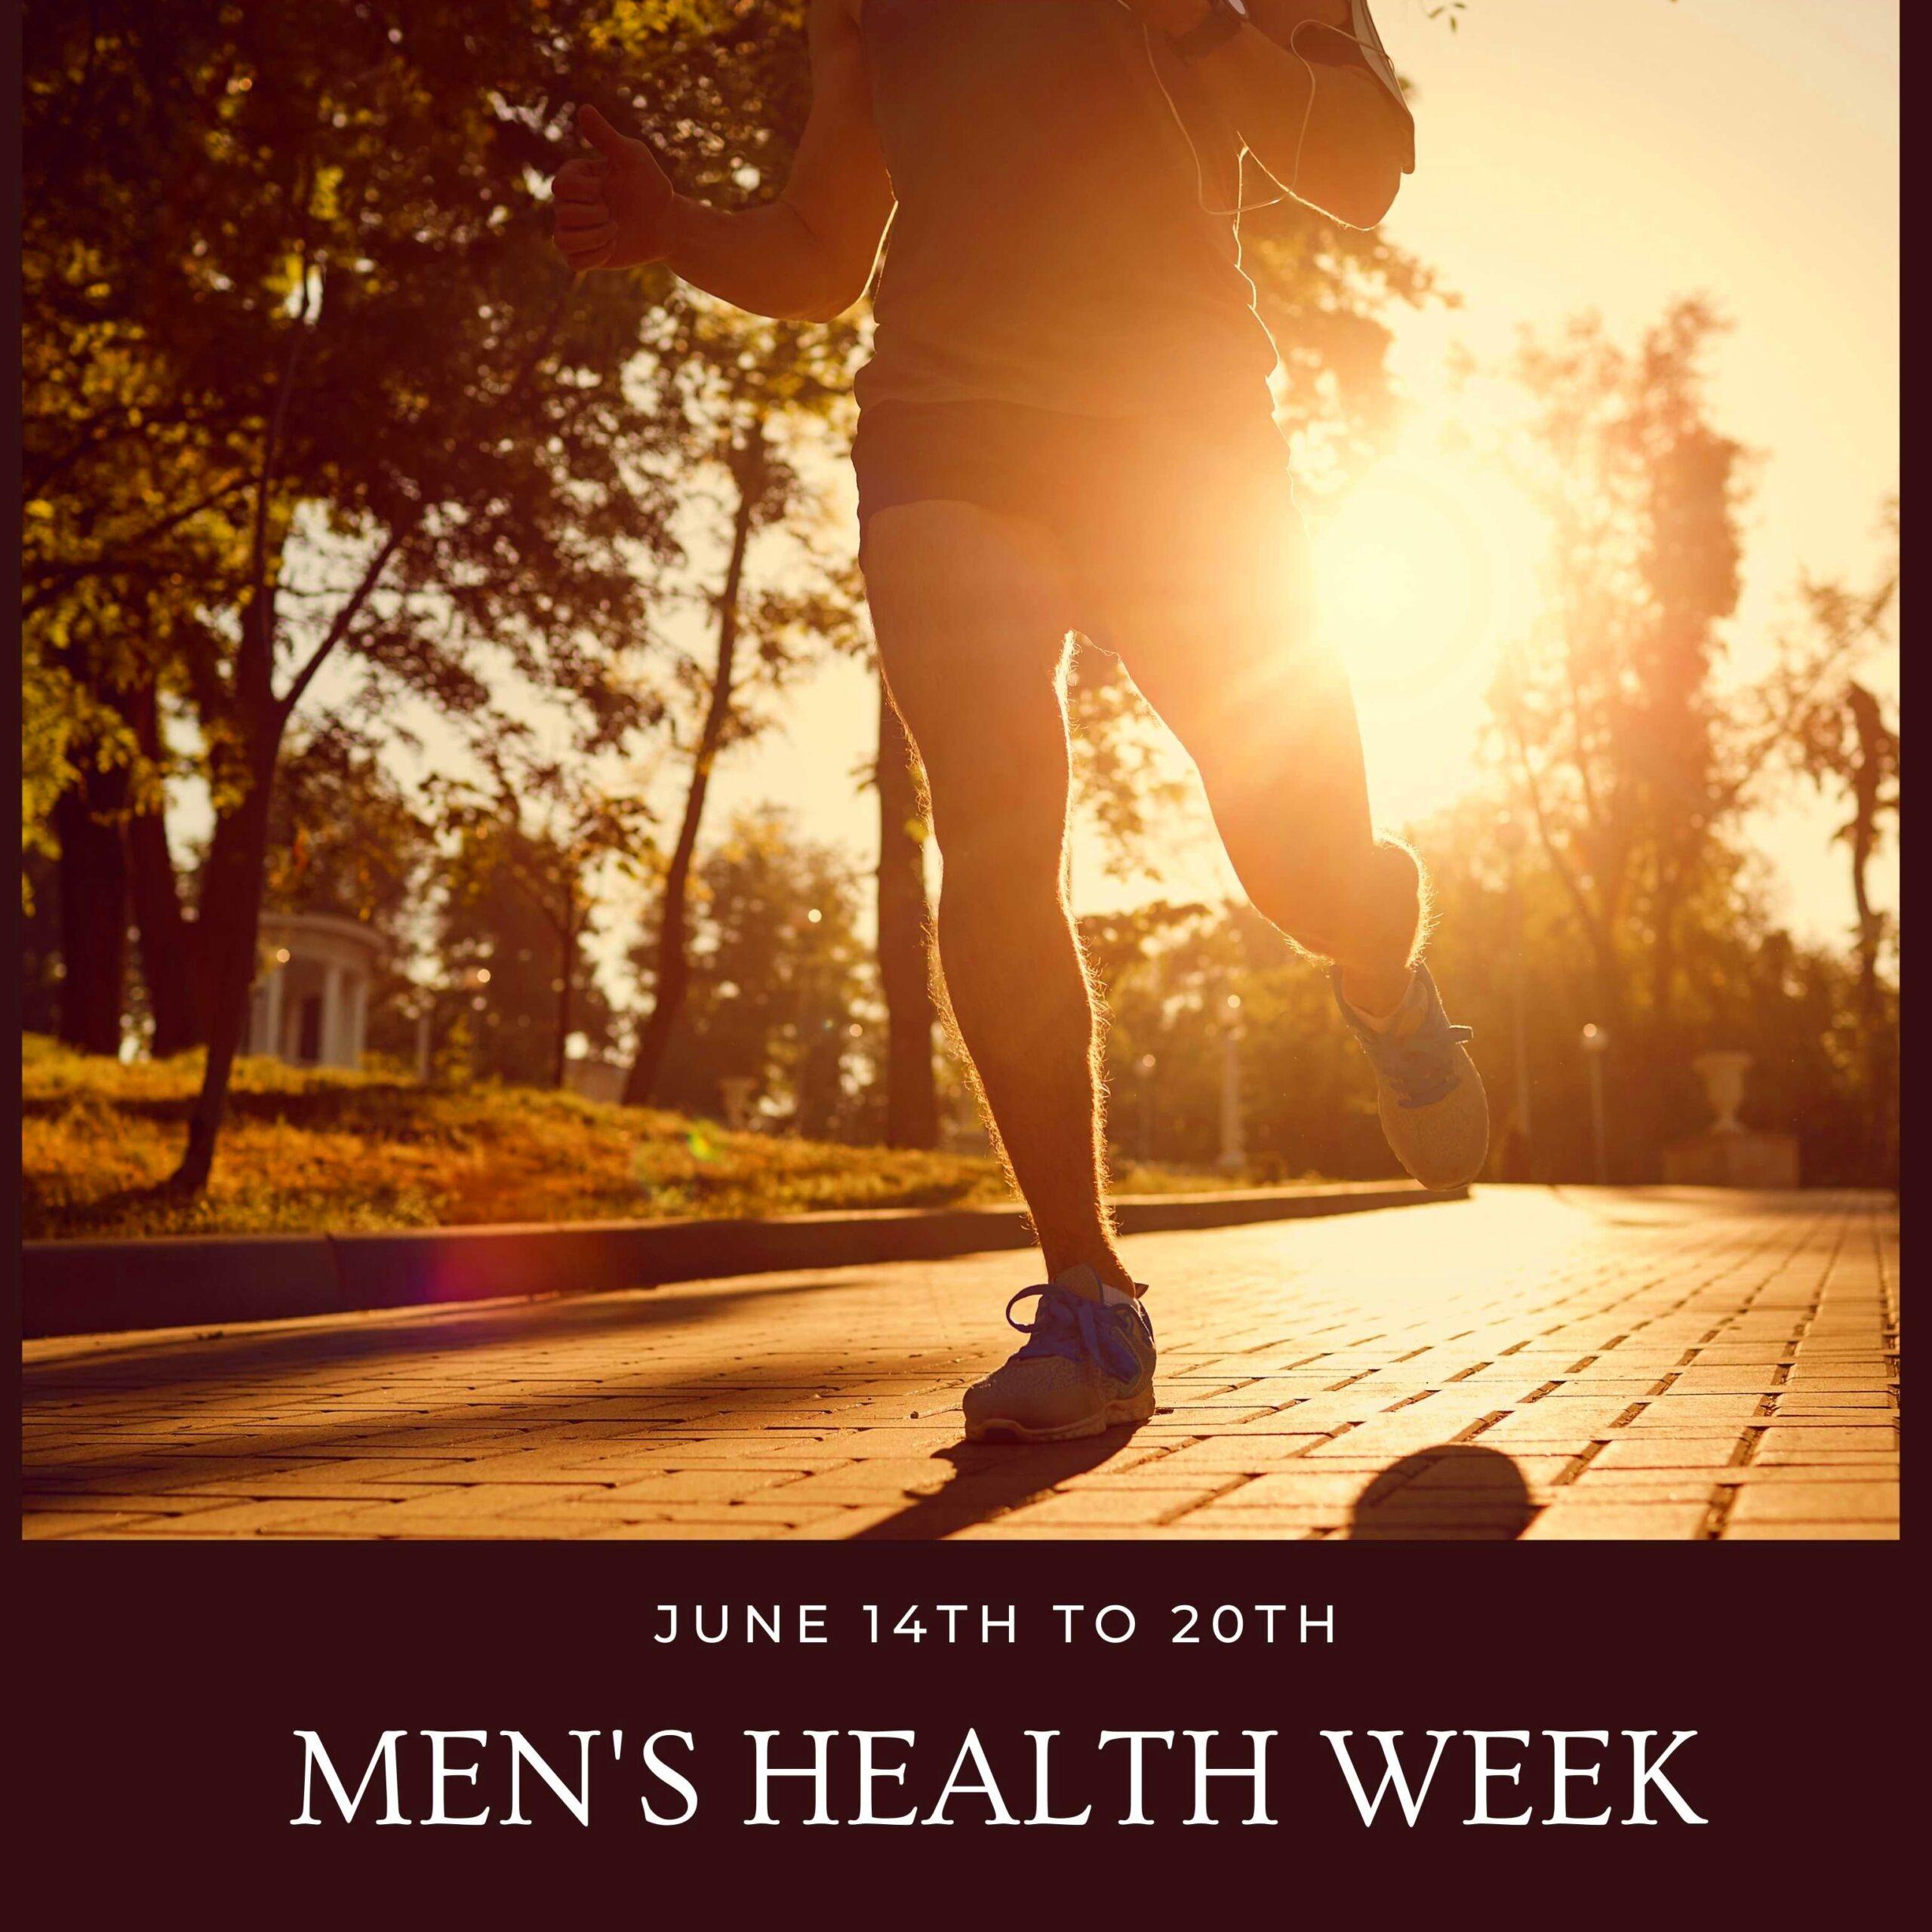 mens health week, the healthy life foundation, mens health, health tips